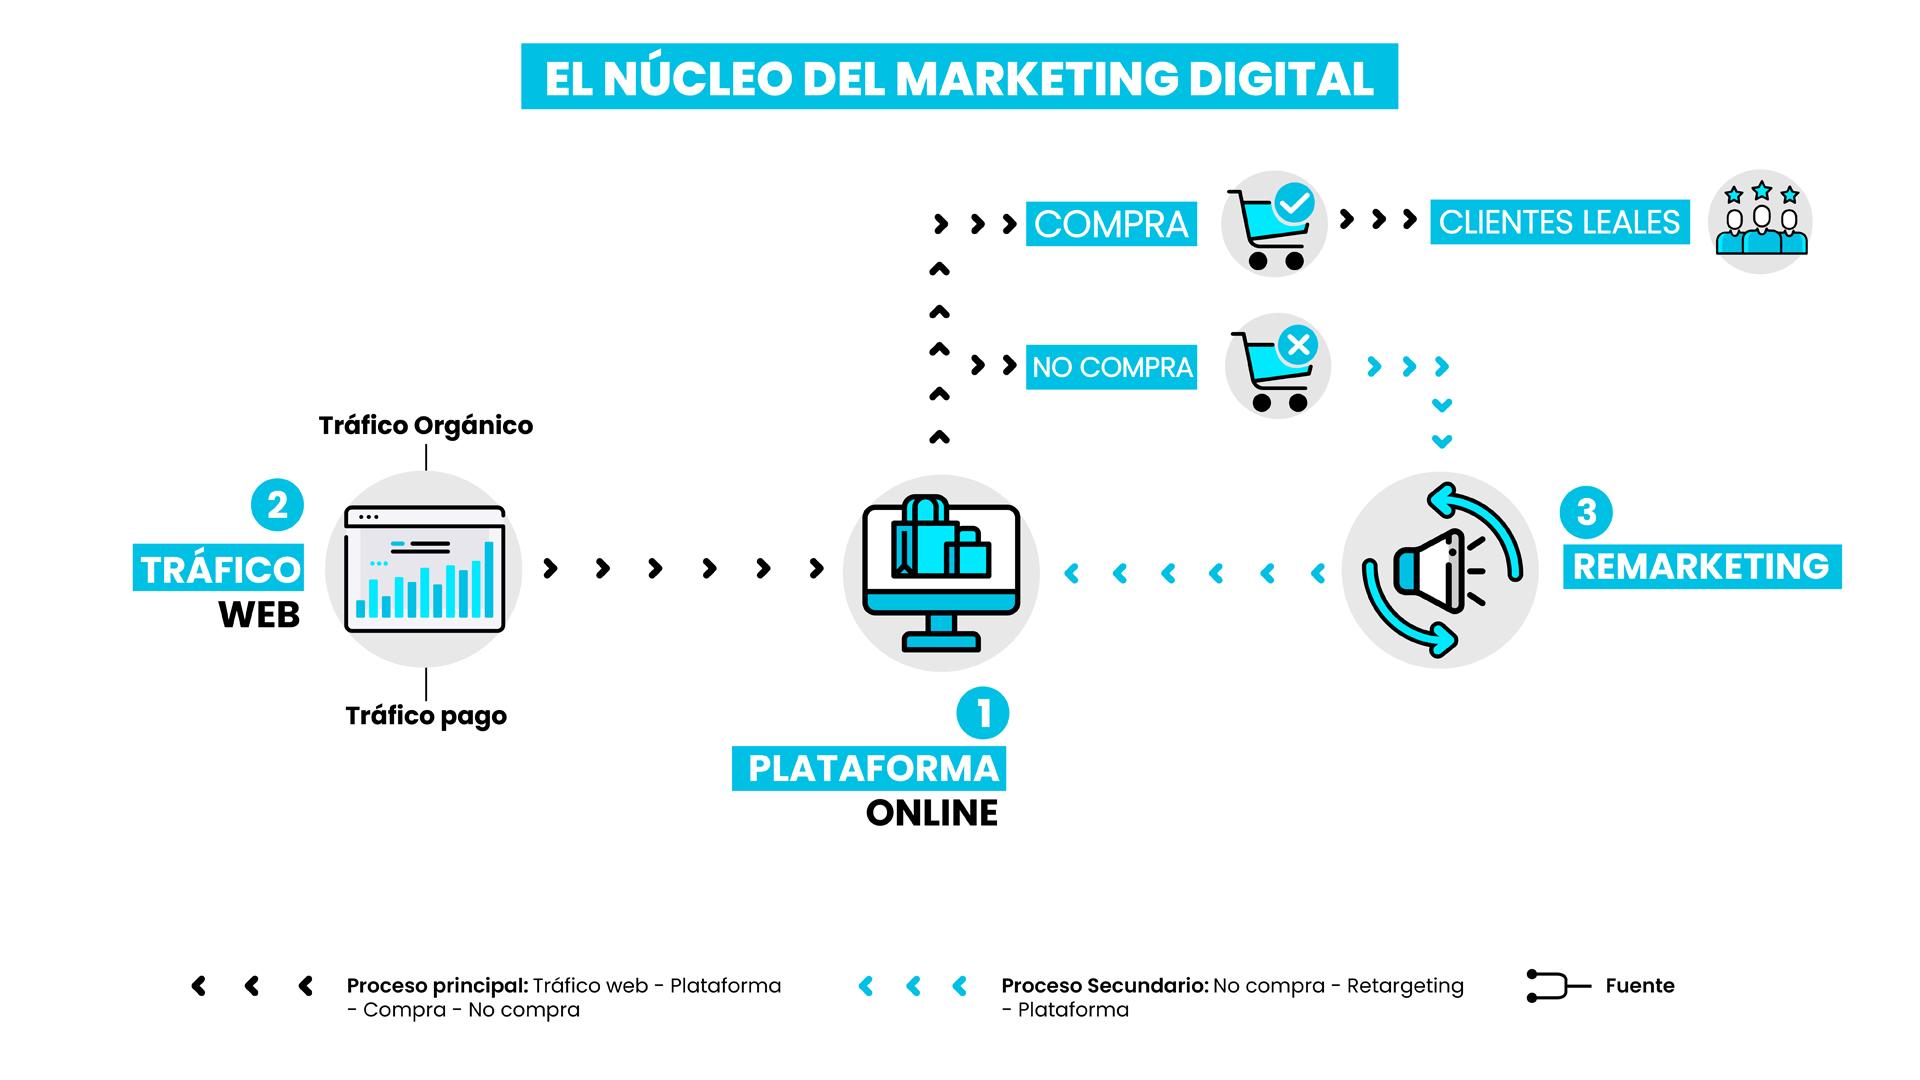 Alve Castellanos Núcleo del Marketing Digital